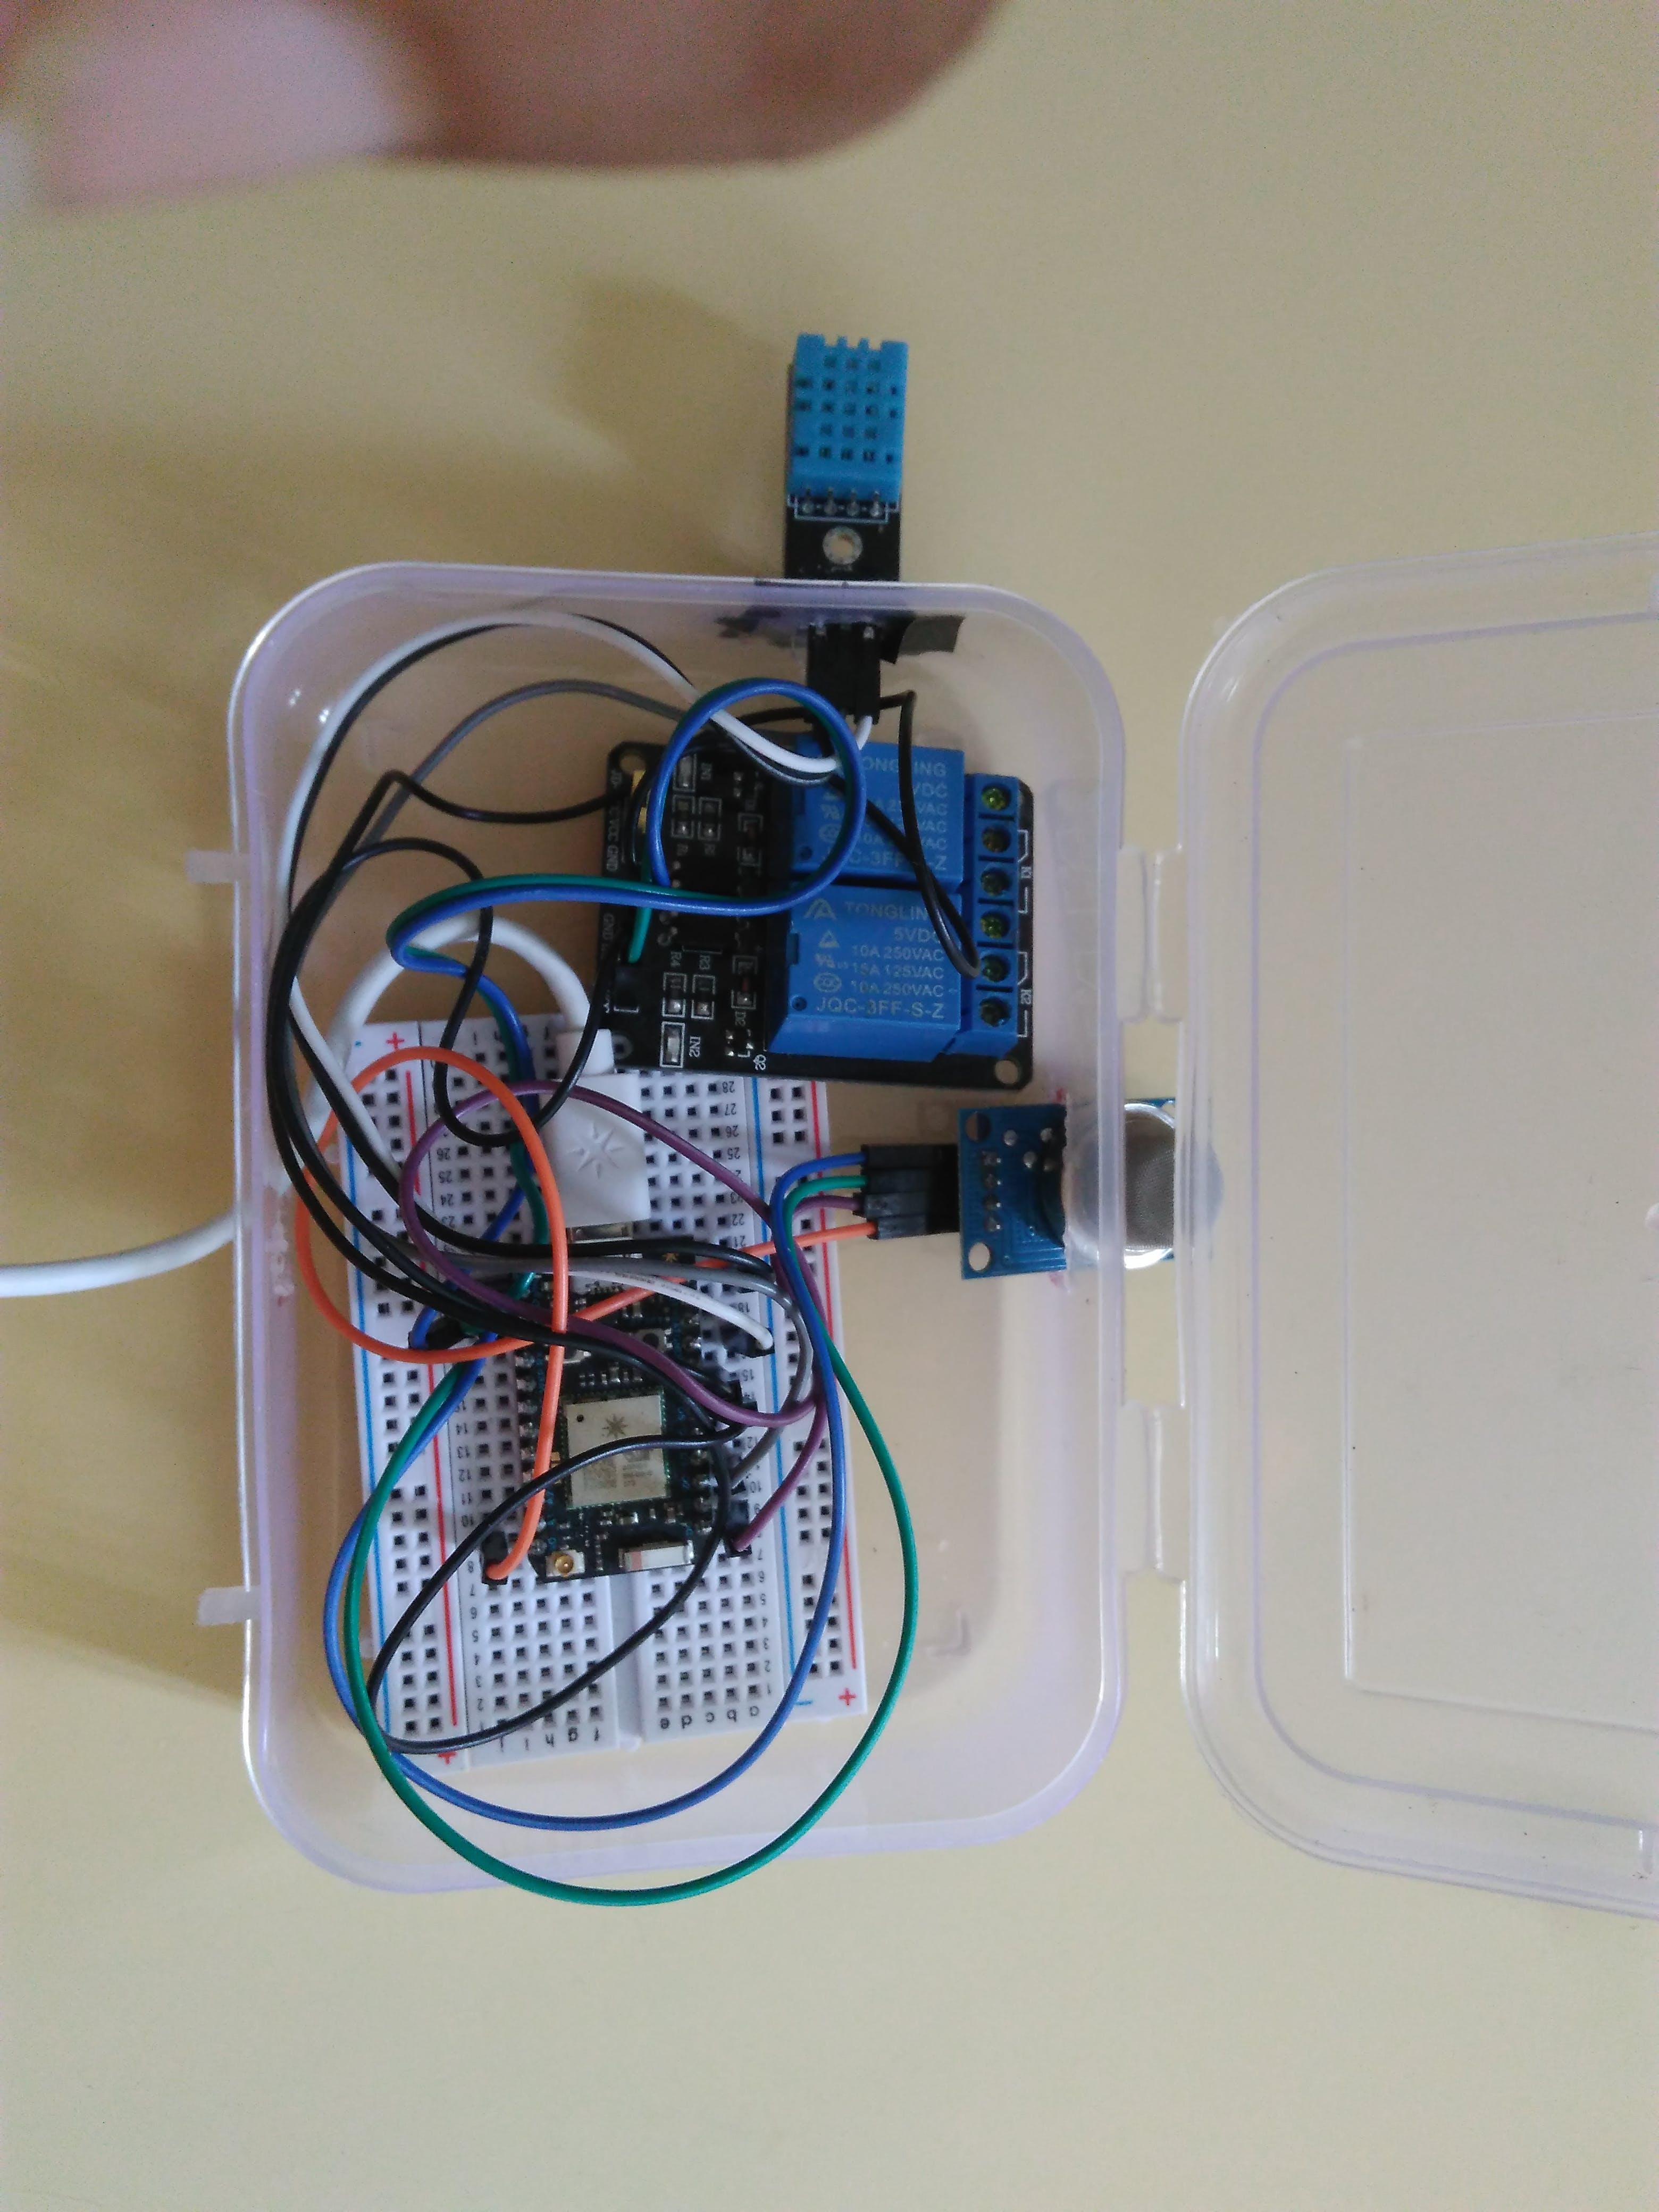 The final hardware circuit